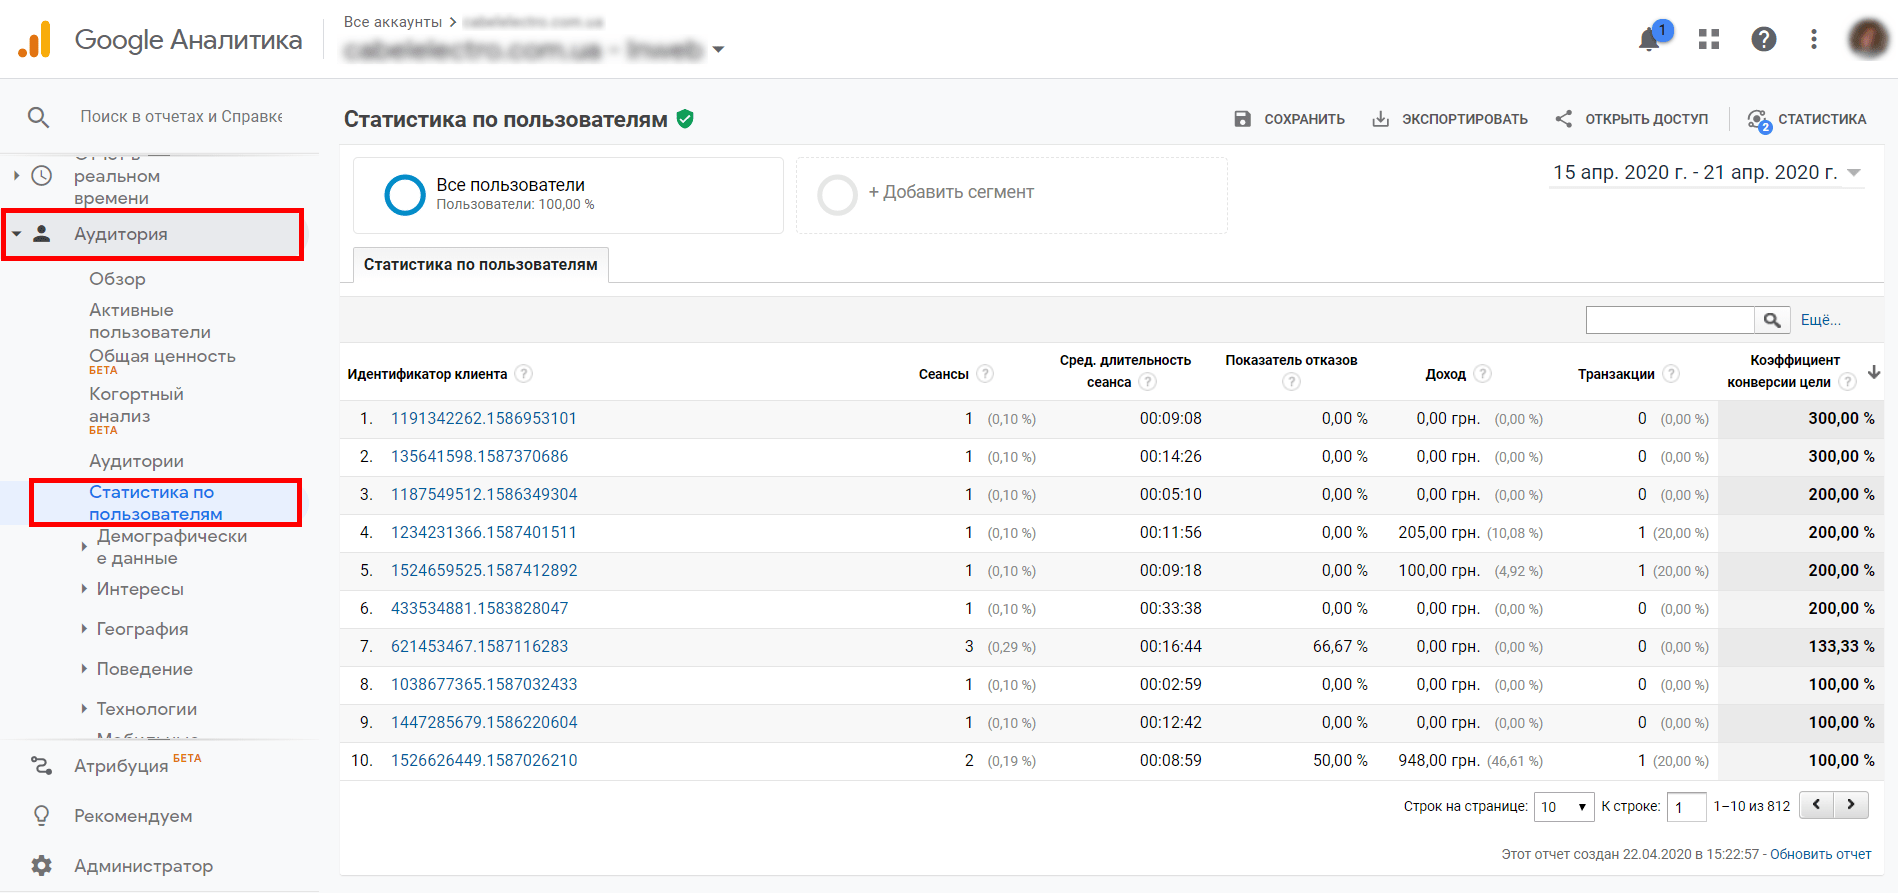 Статистика по пользователям - Client ID